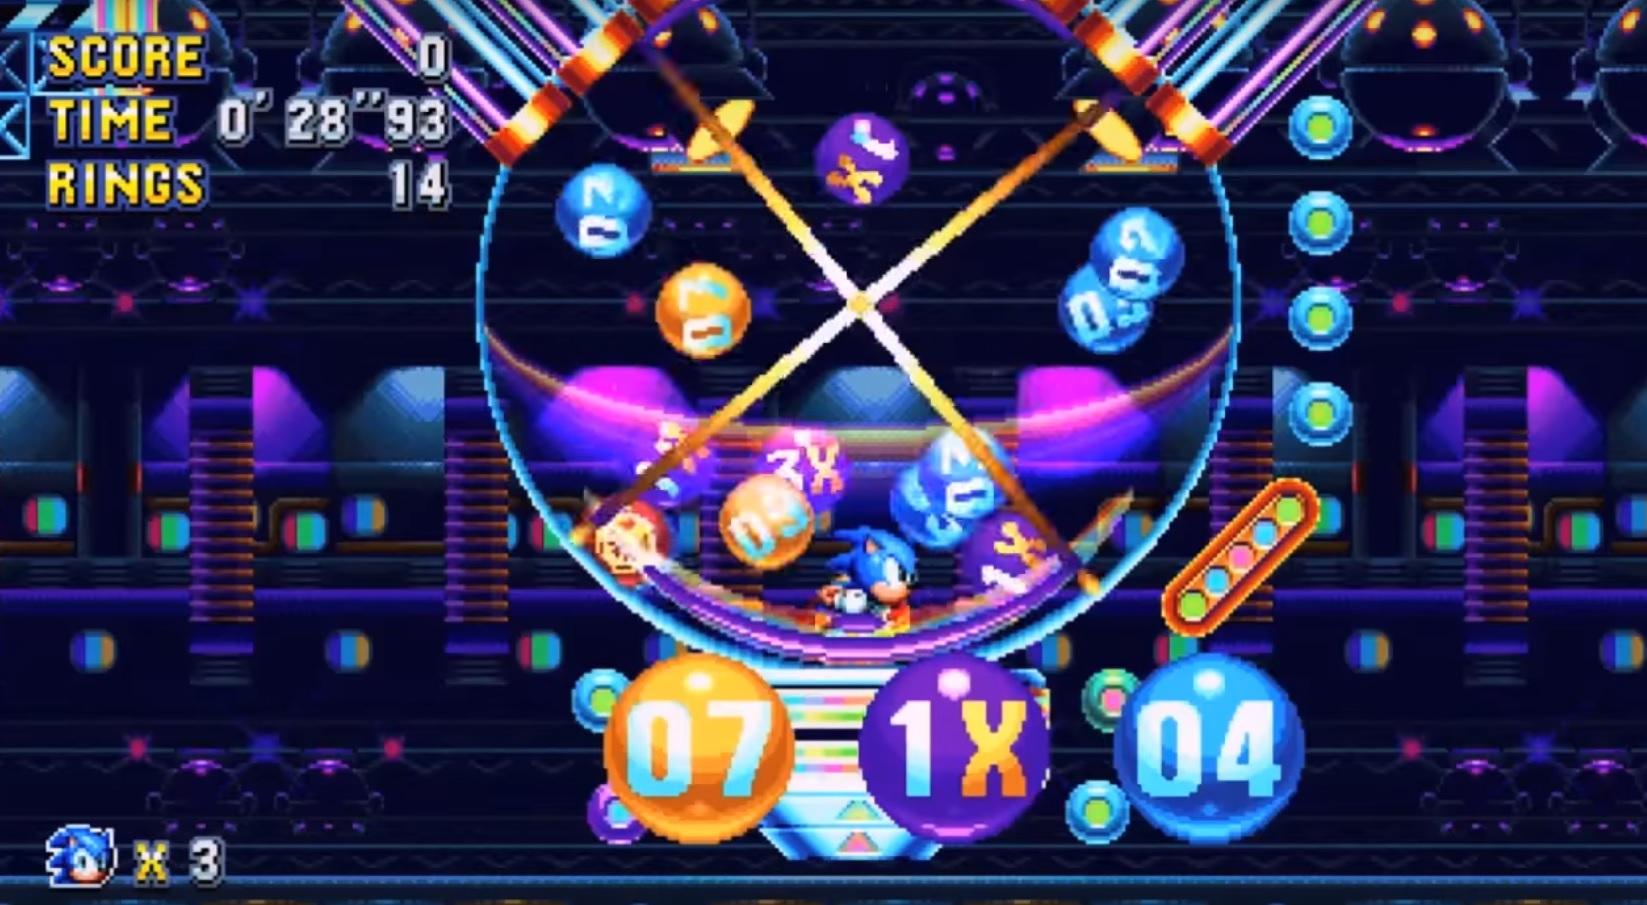 sonic-mania-screenshot-01